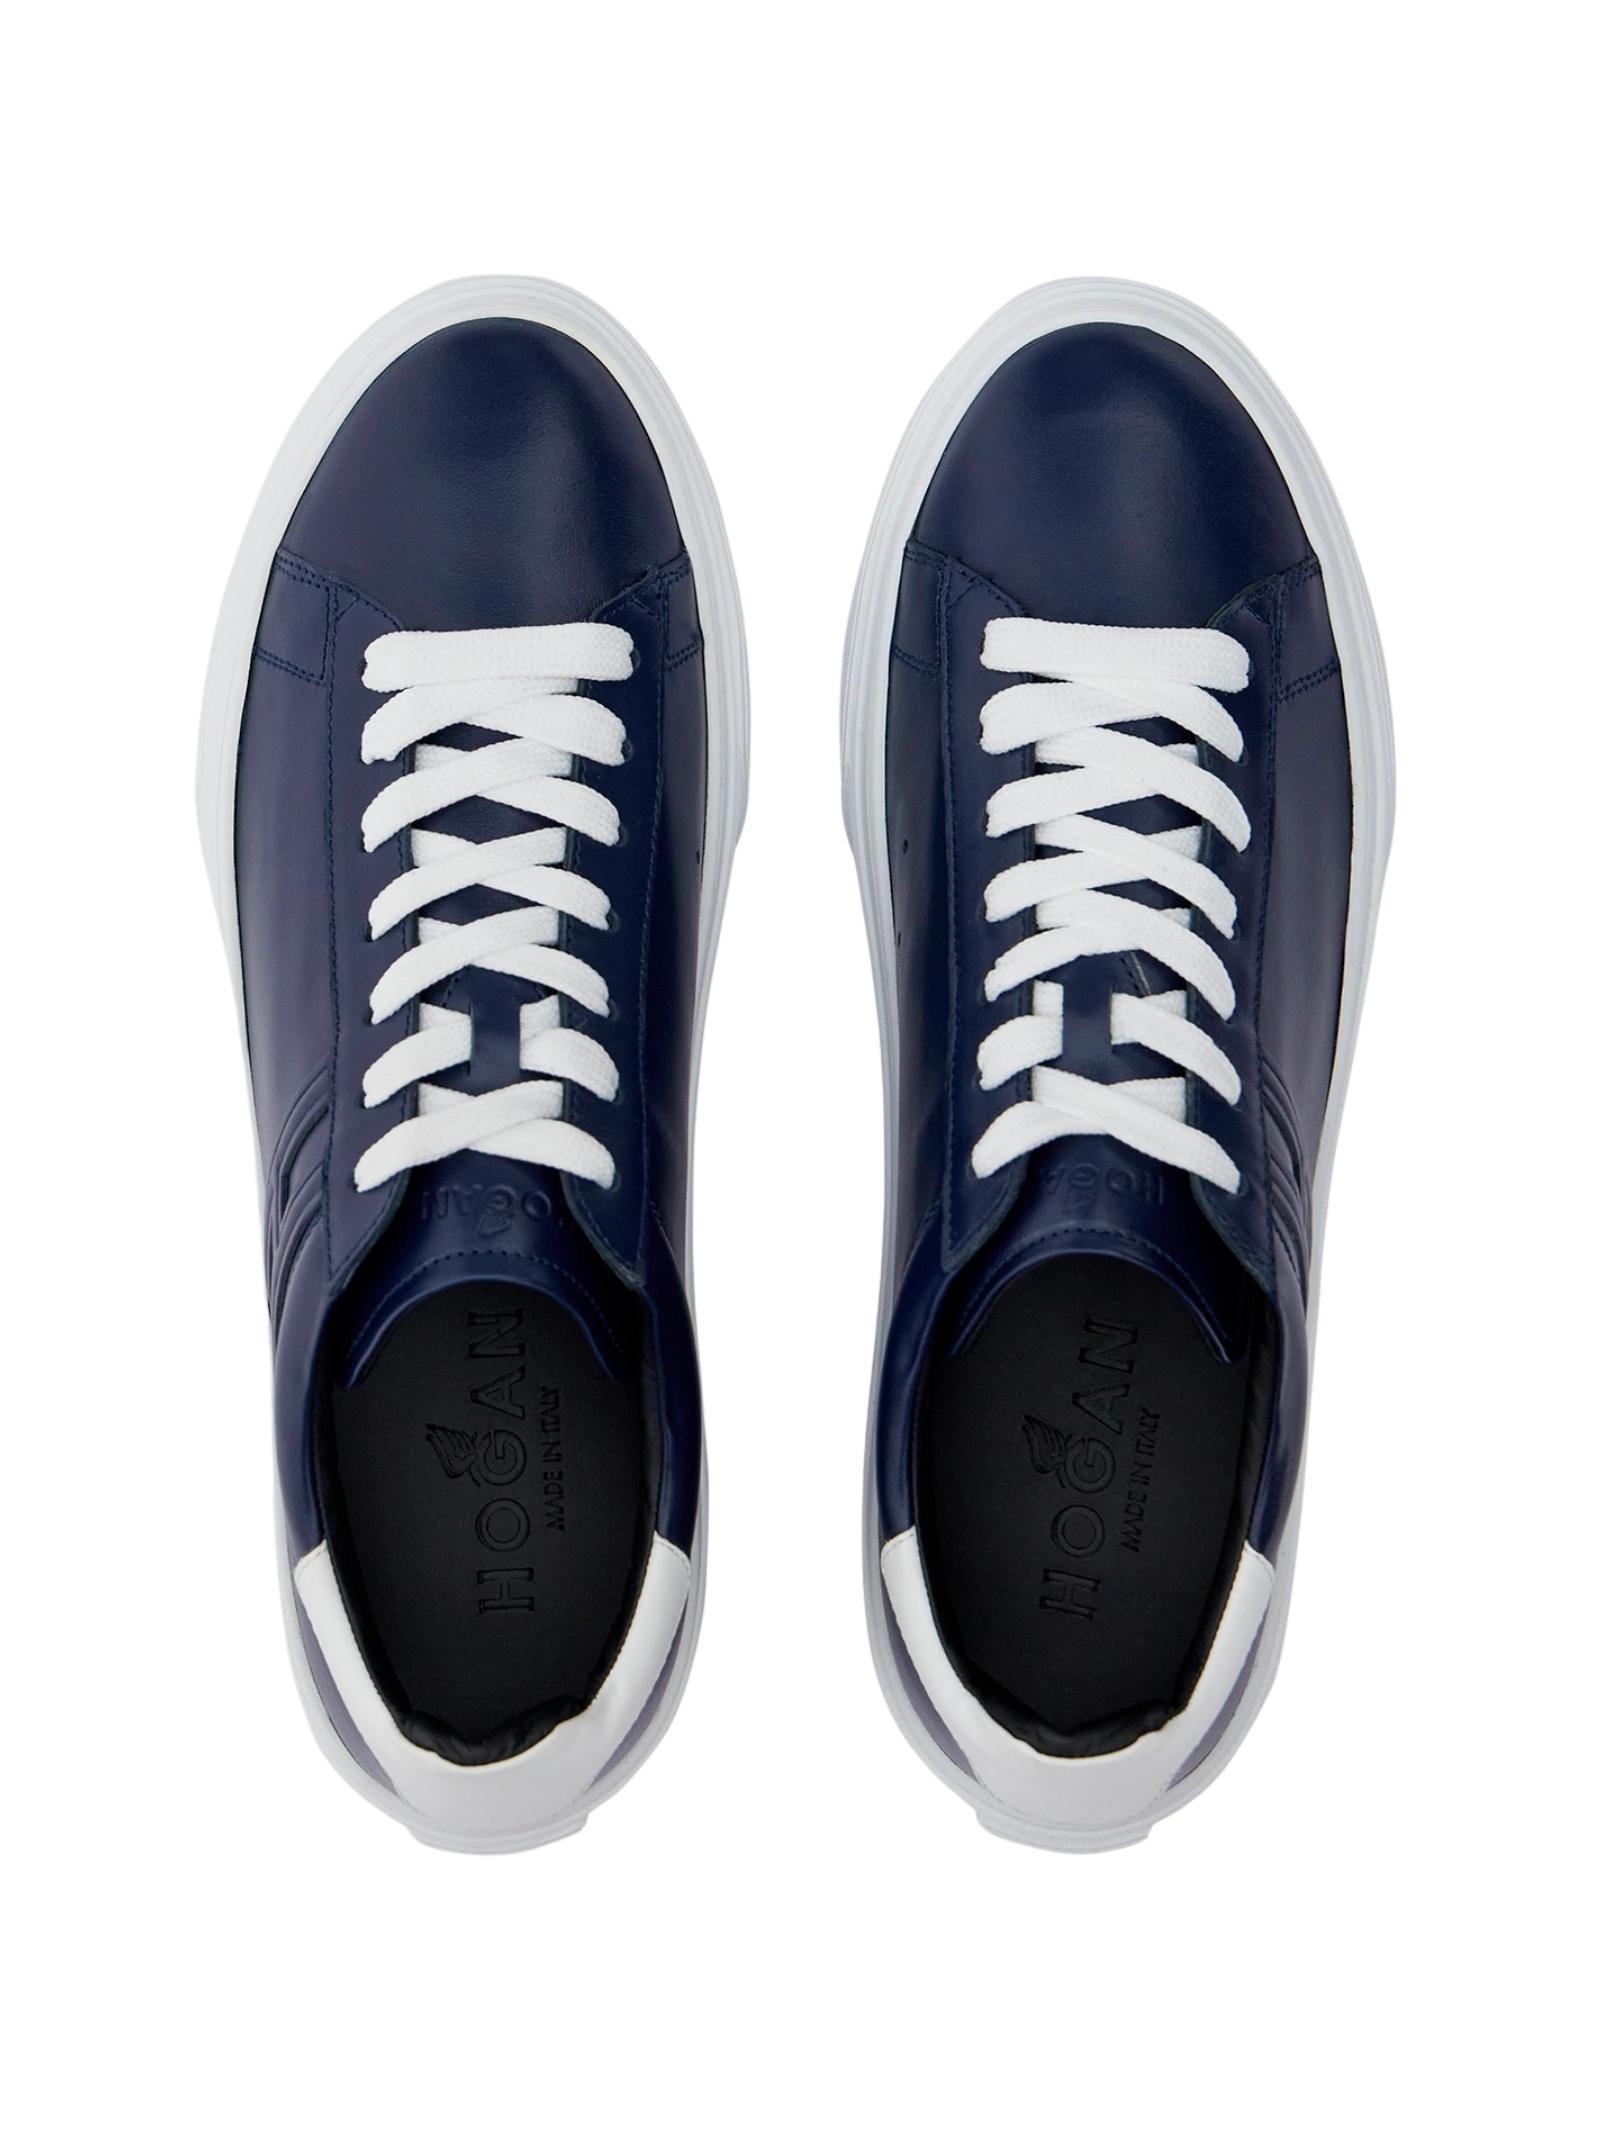 HOGAN | Shoes | HXM3650J960KLA0RSL